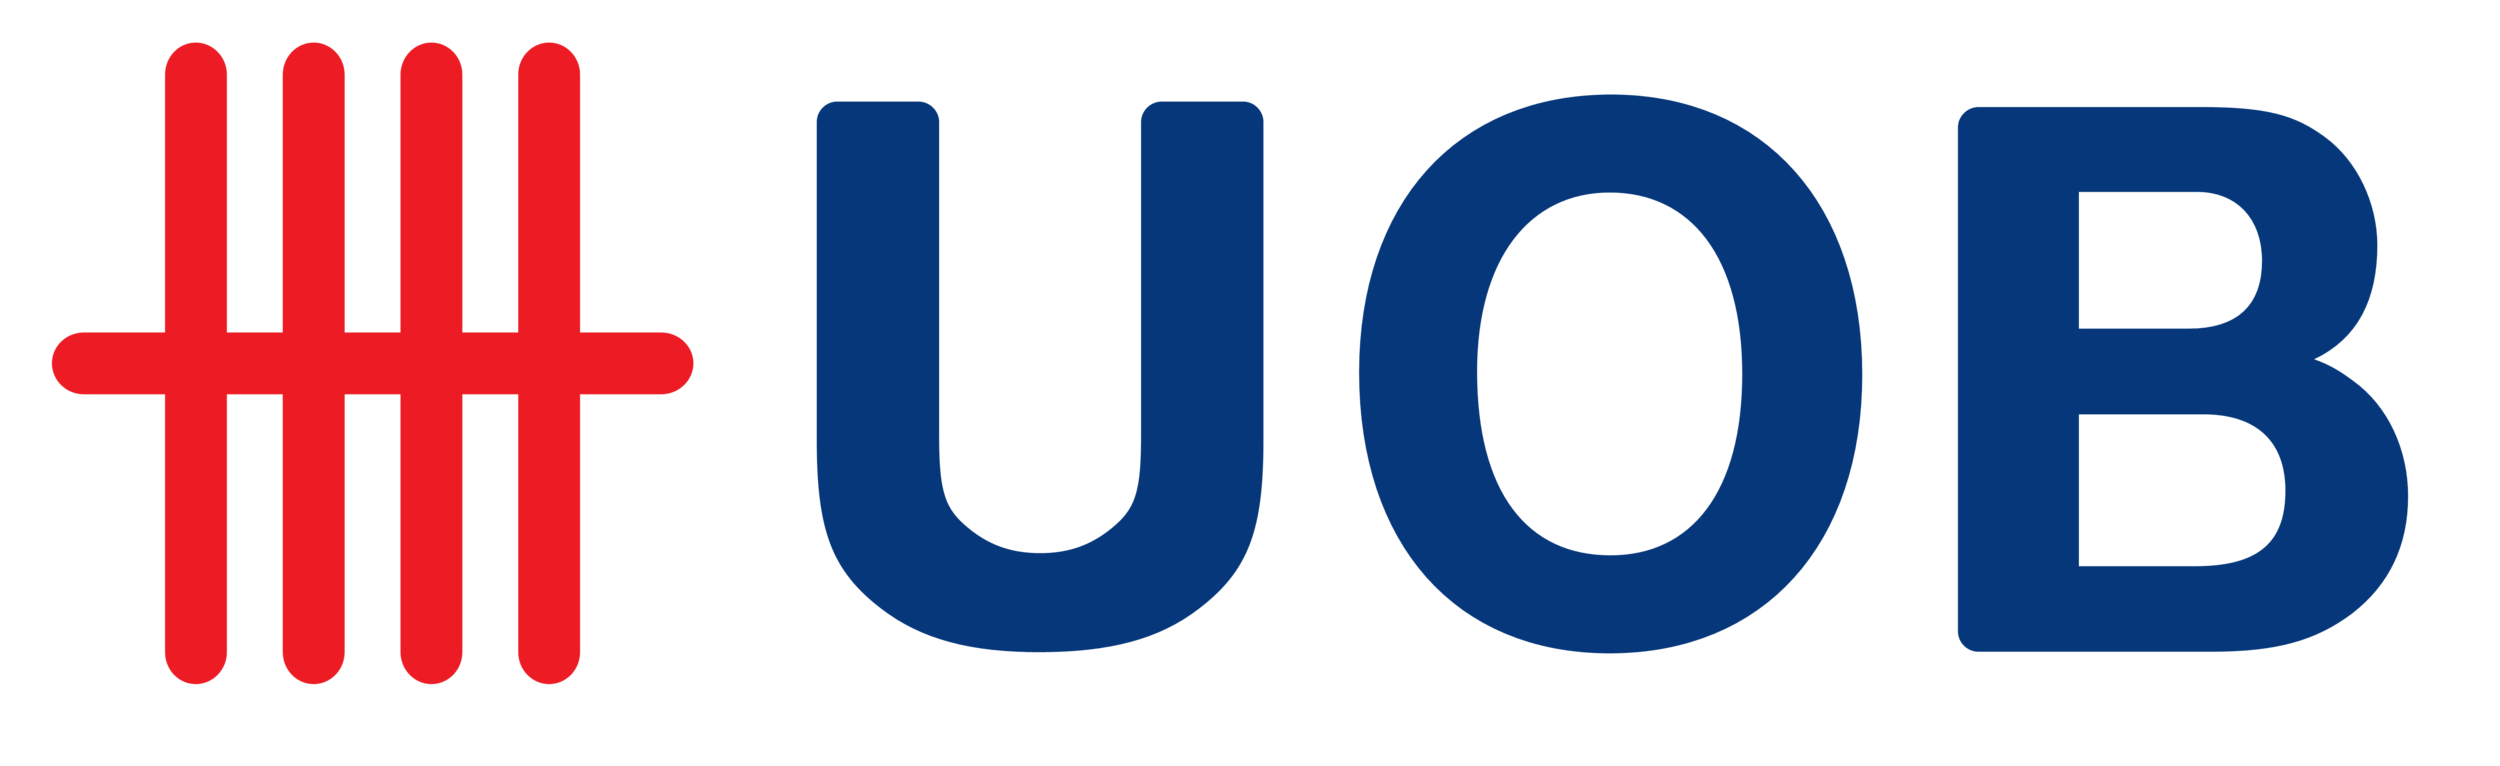 UOB Preferred Platinum Visa Card | Photo Credit: UOB